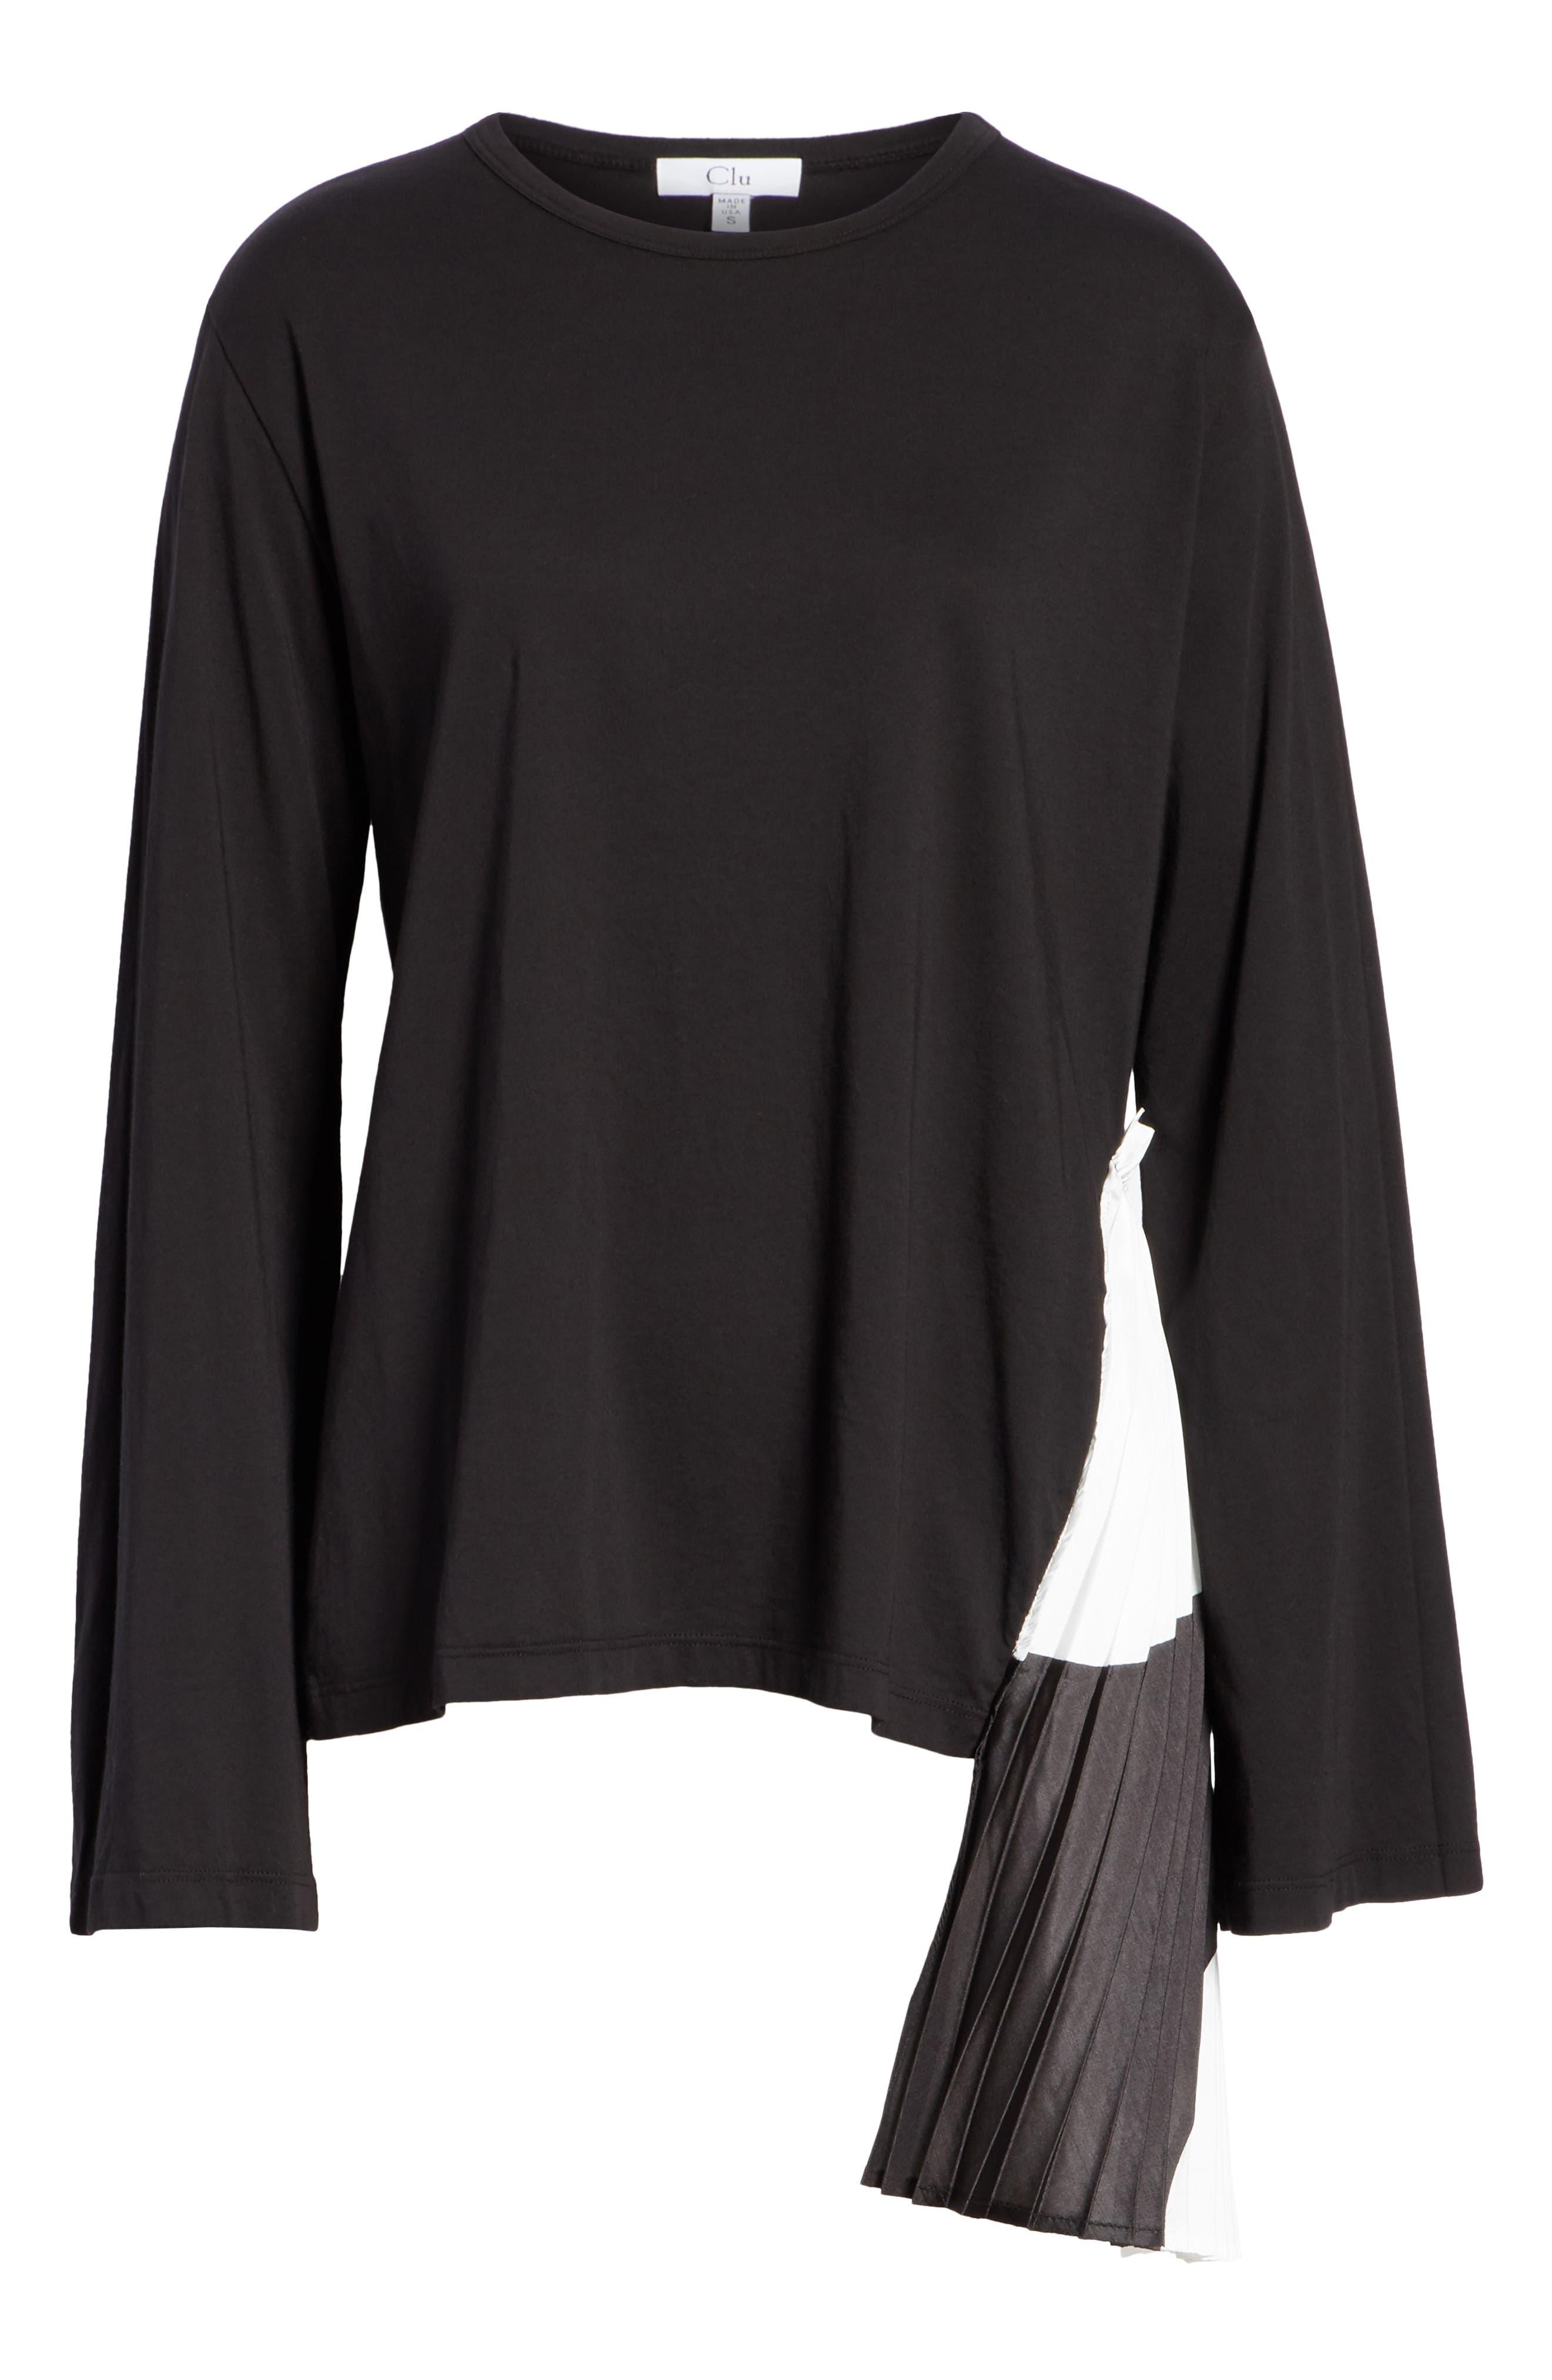 Pleat Accent Crewneck Long Sleeve Top,                             Alternate thumbnail 6, color,                             BLACK/ BLACK/ WHITE